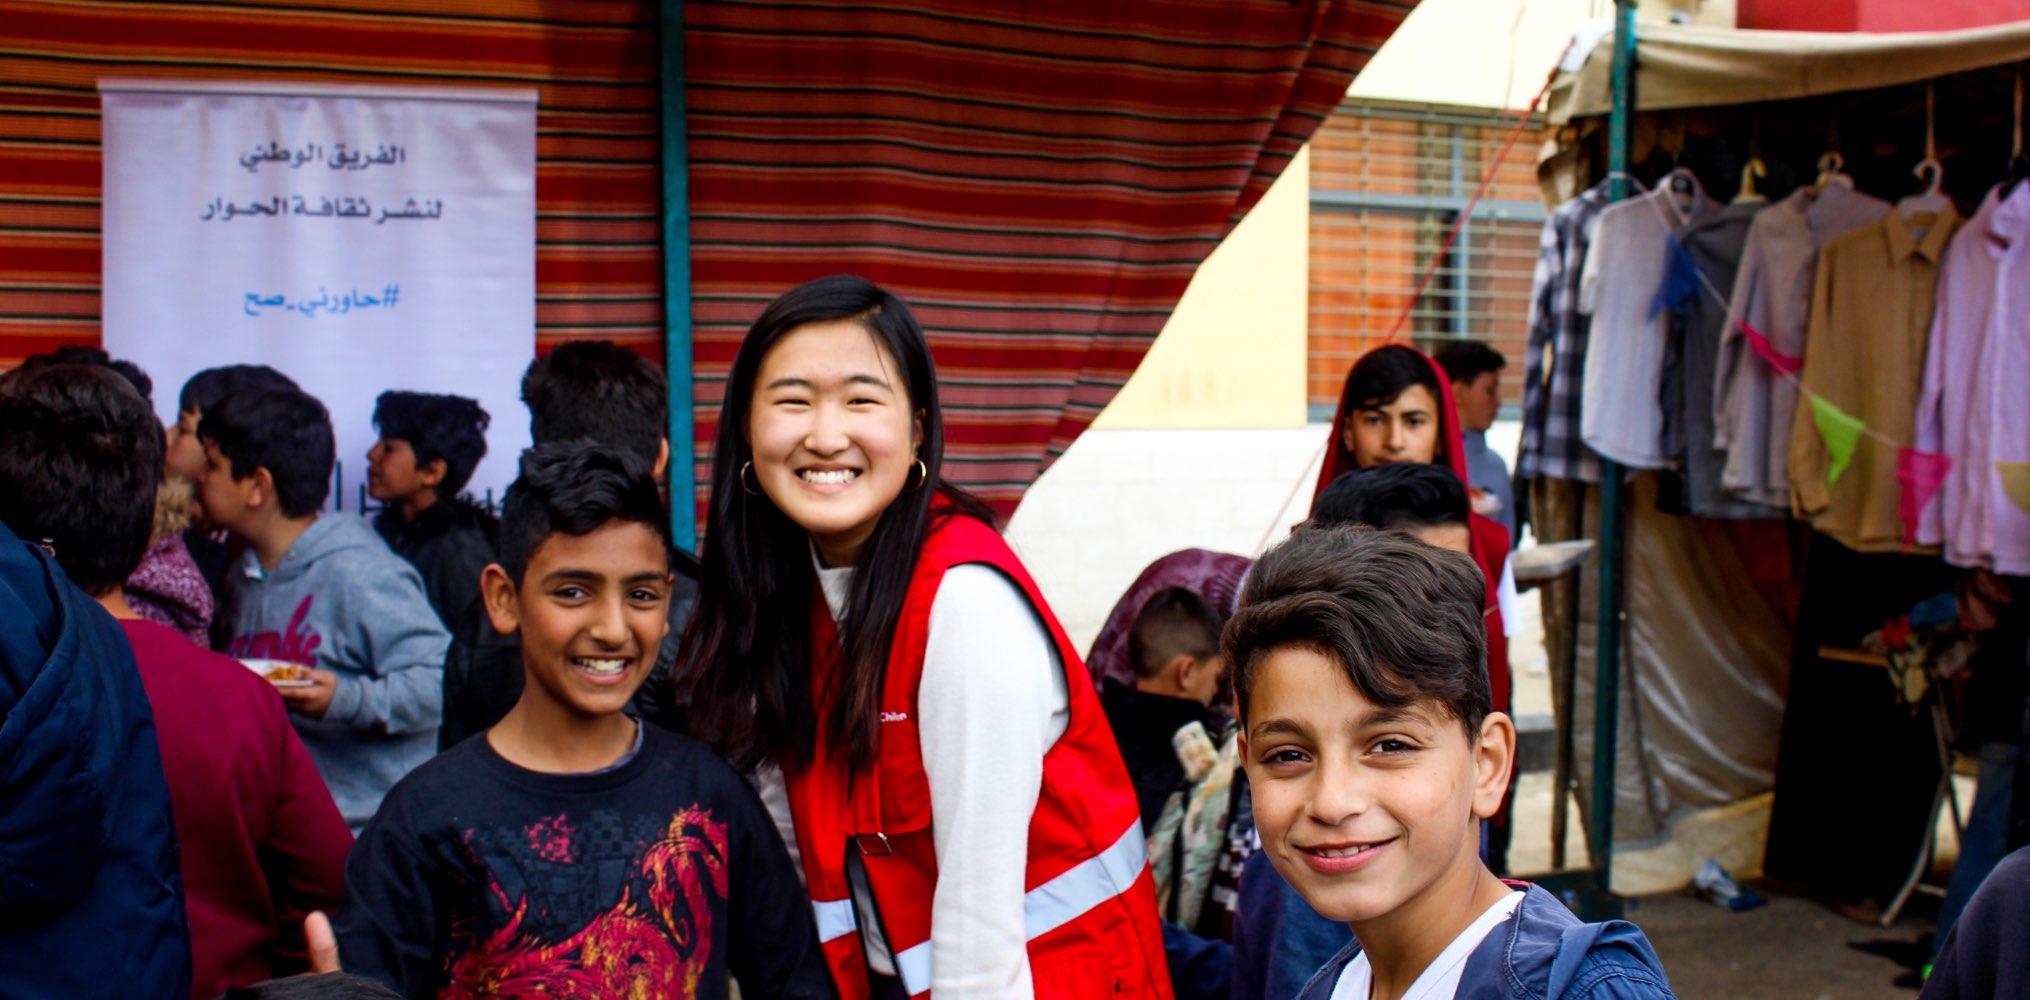 SIT student with refugee children in Jordan